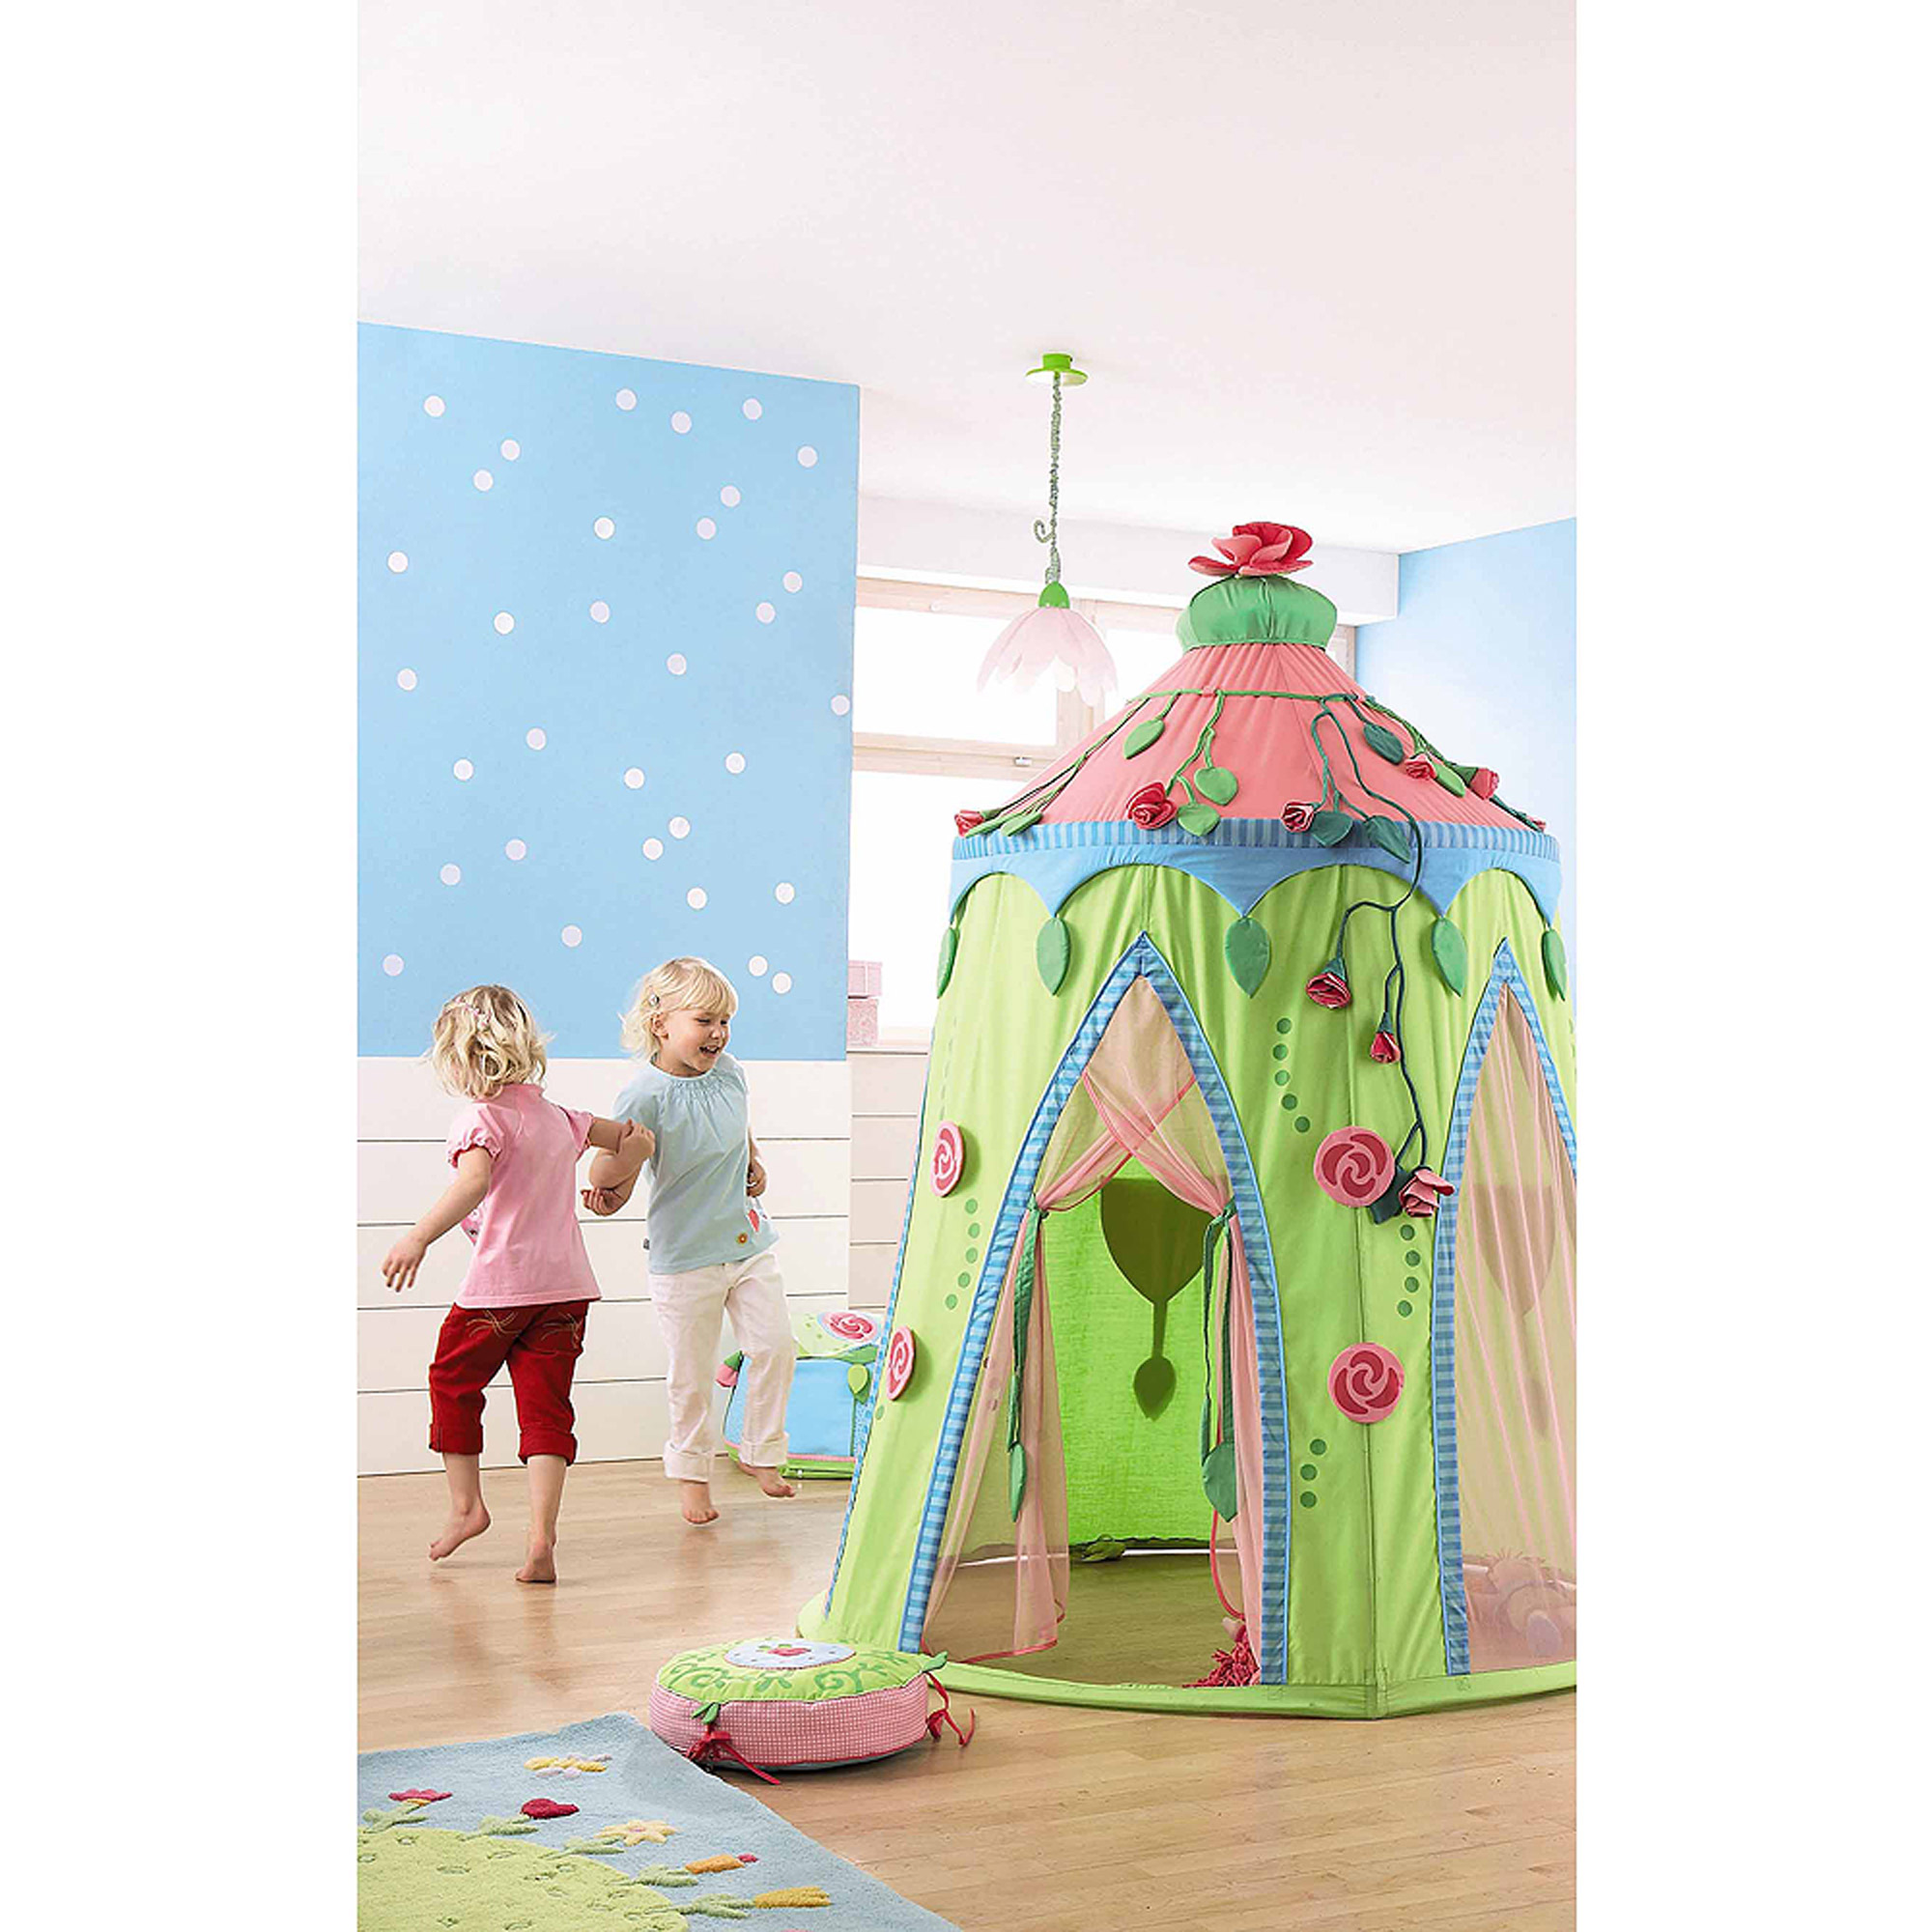 sc 1 st  Walmart & HABA Rose Fairy Play Tent - Walmart.com